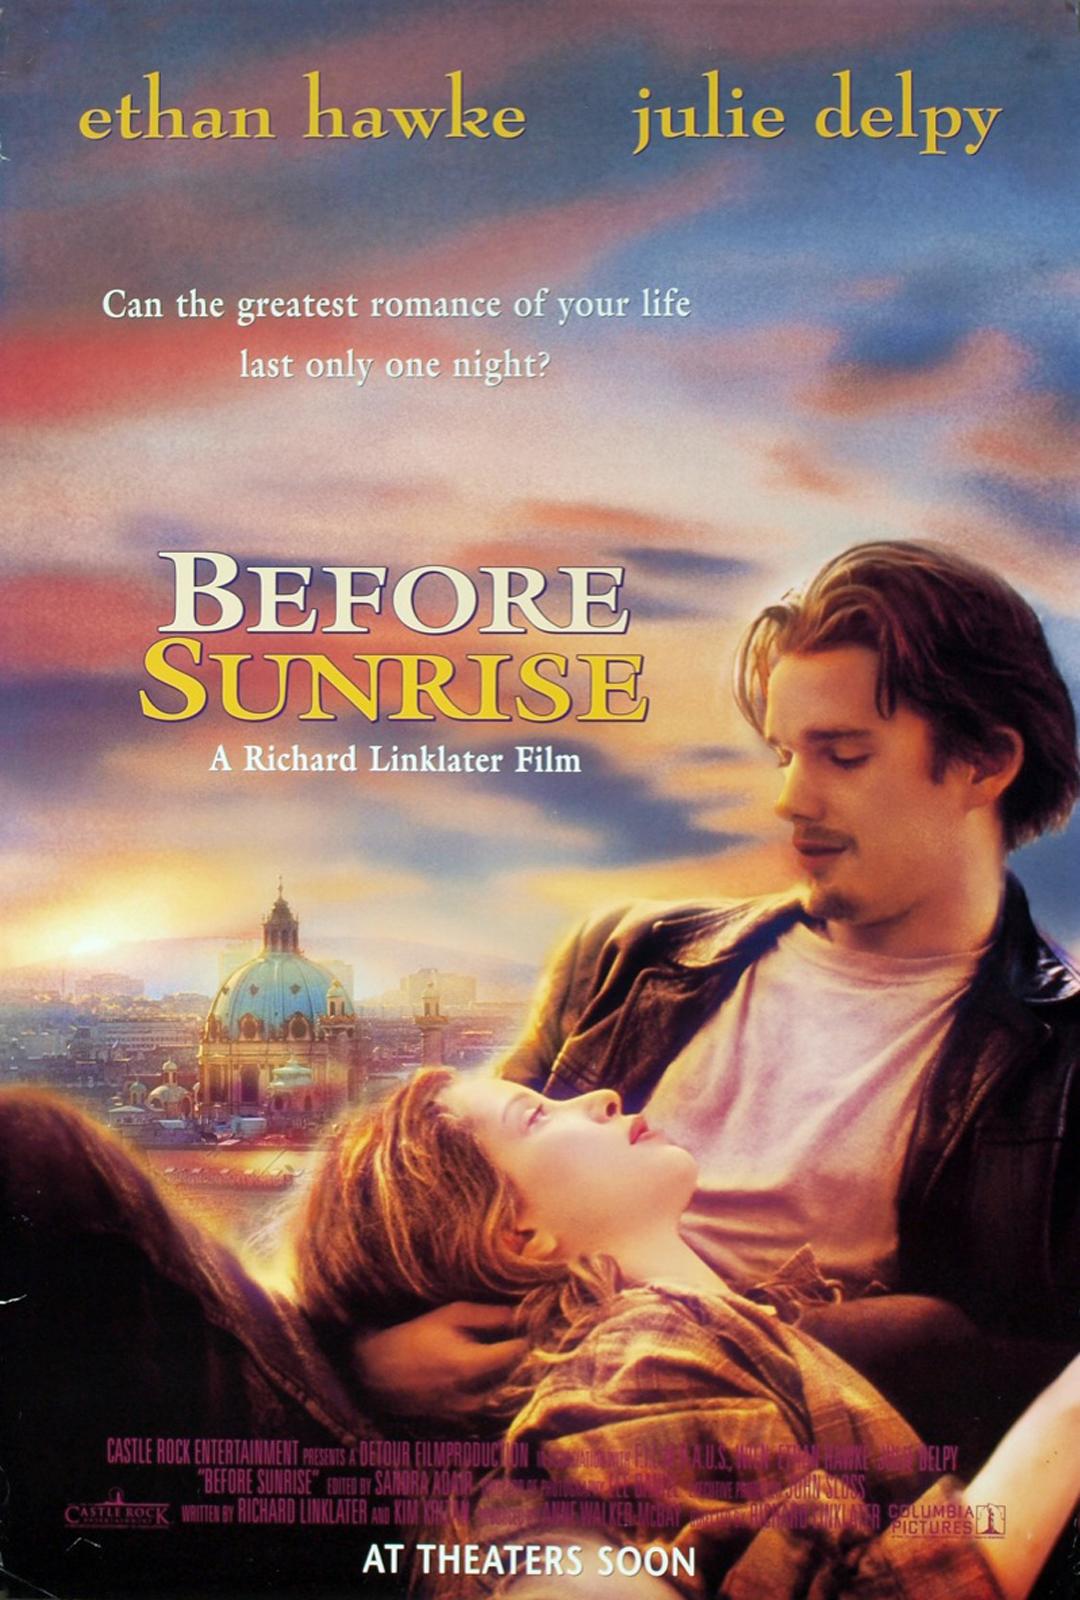 Movies - Before Sunrise